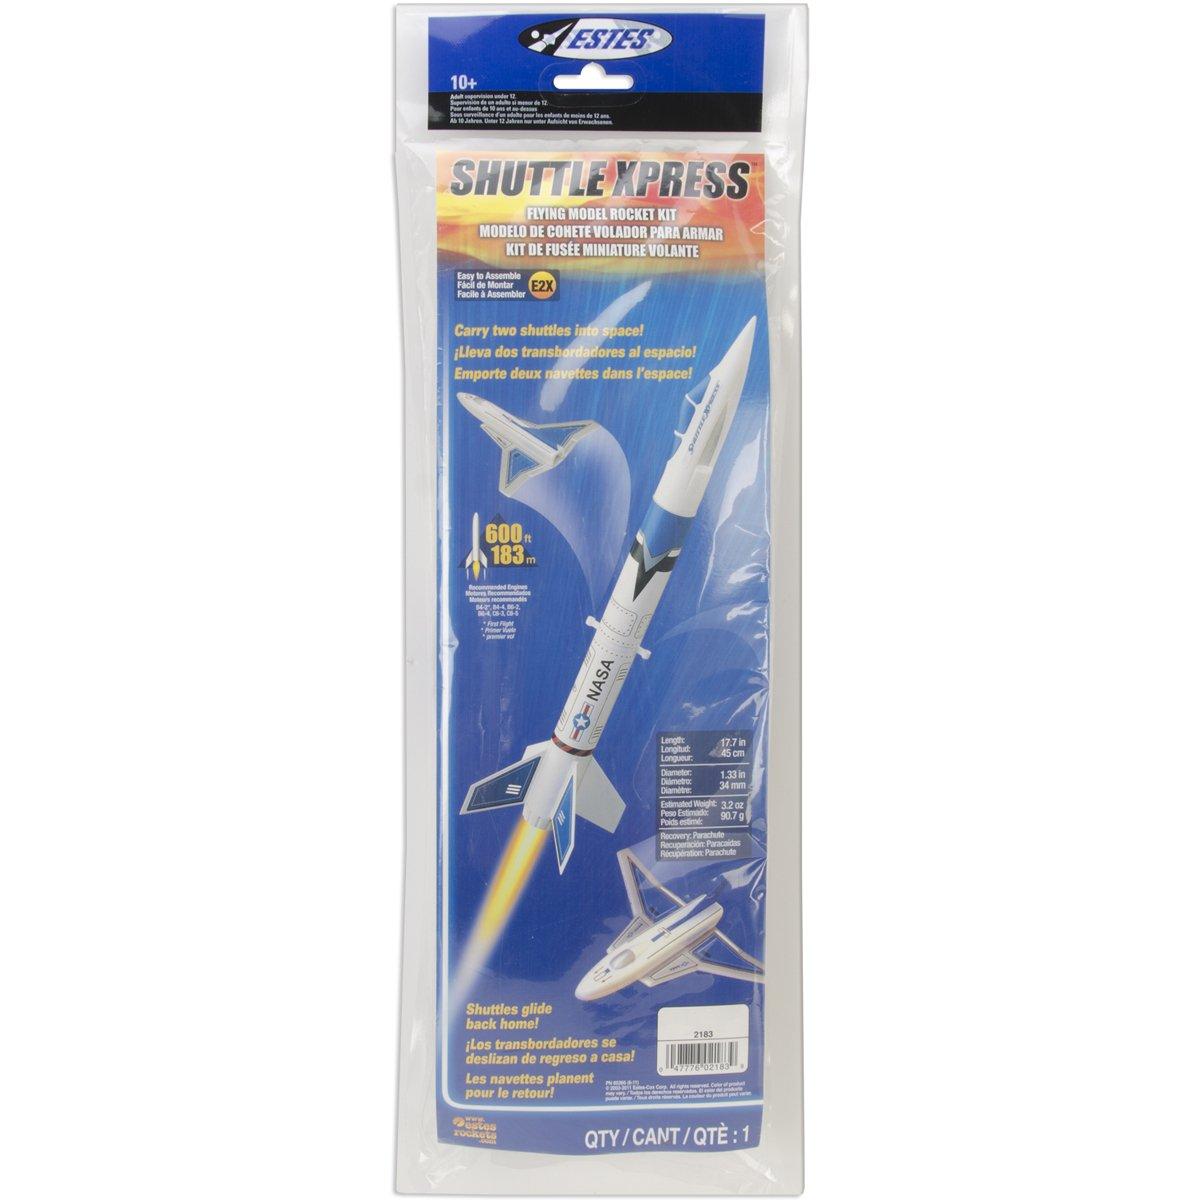 Estes 2183 Shuttle Xpress Flying Model Rocket Kit Estes CA